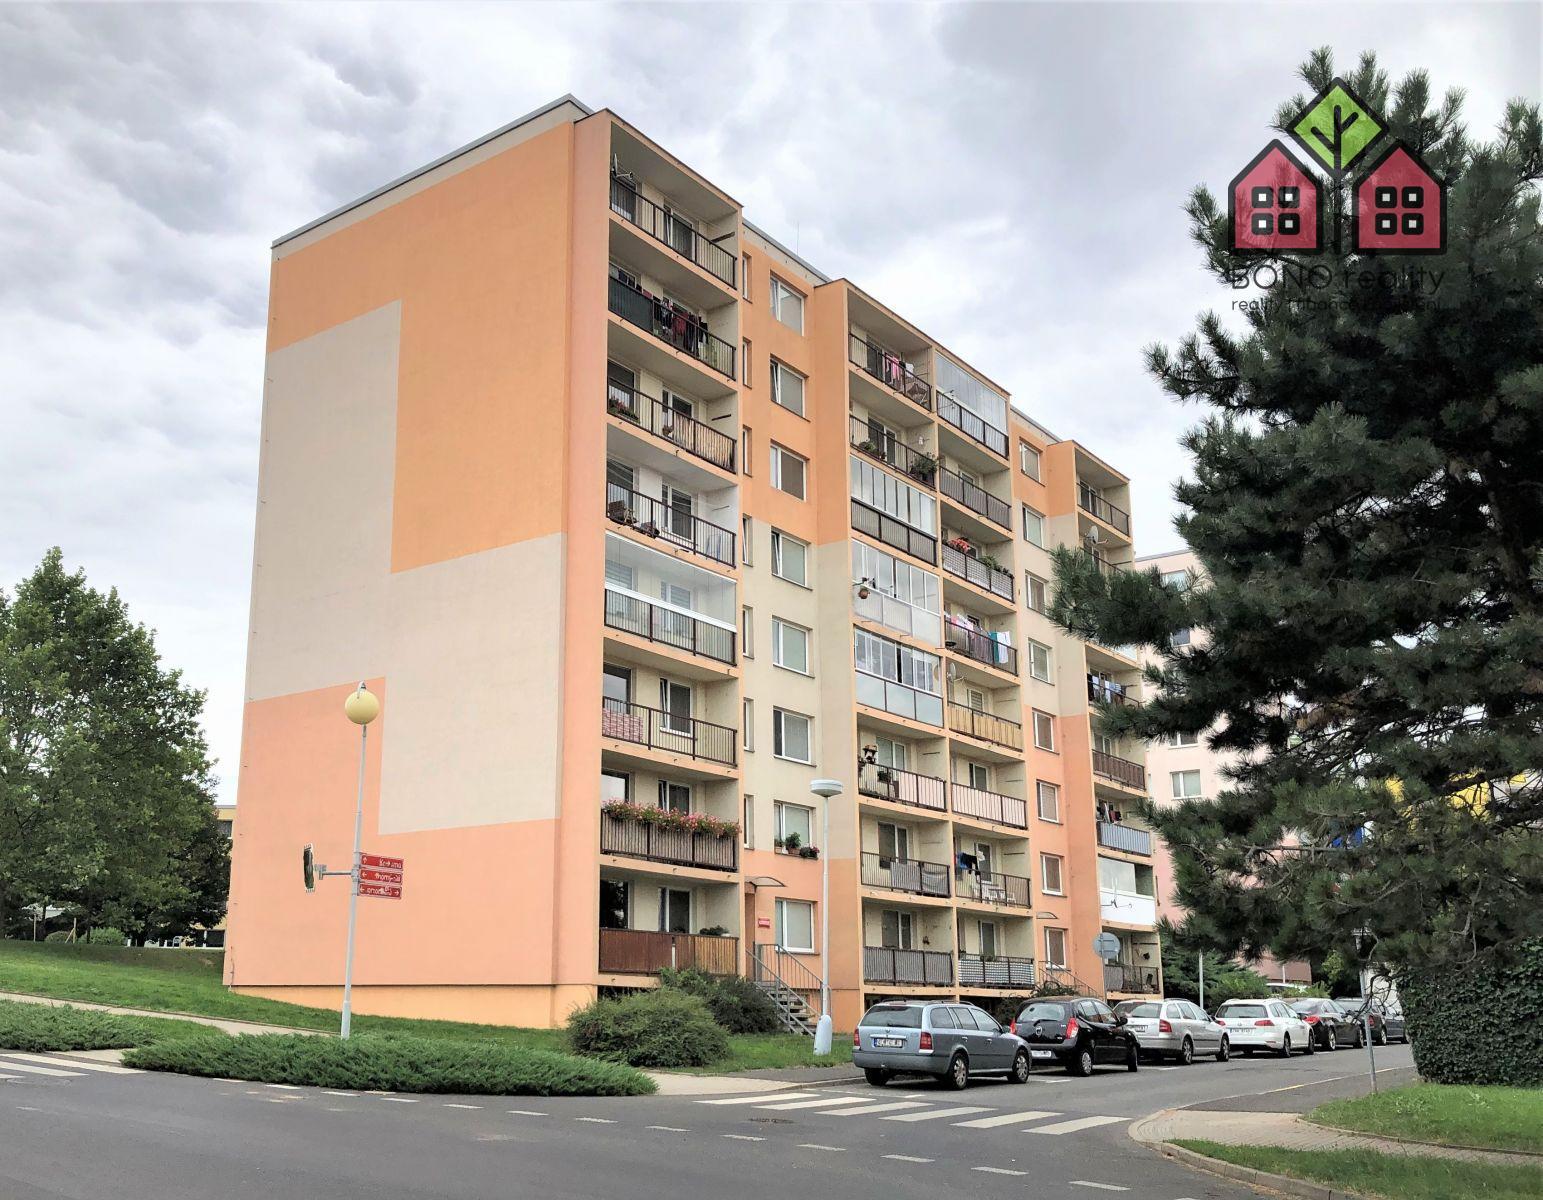 Pronájem 2+kk, OV, 40 m2, sklep, obec Litoměřice, ulice Kosmonautů